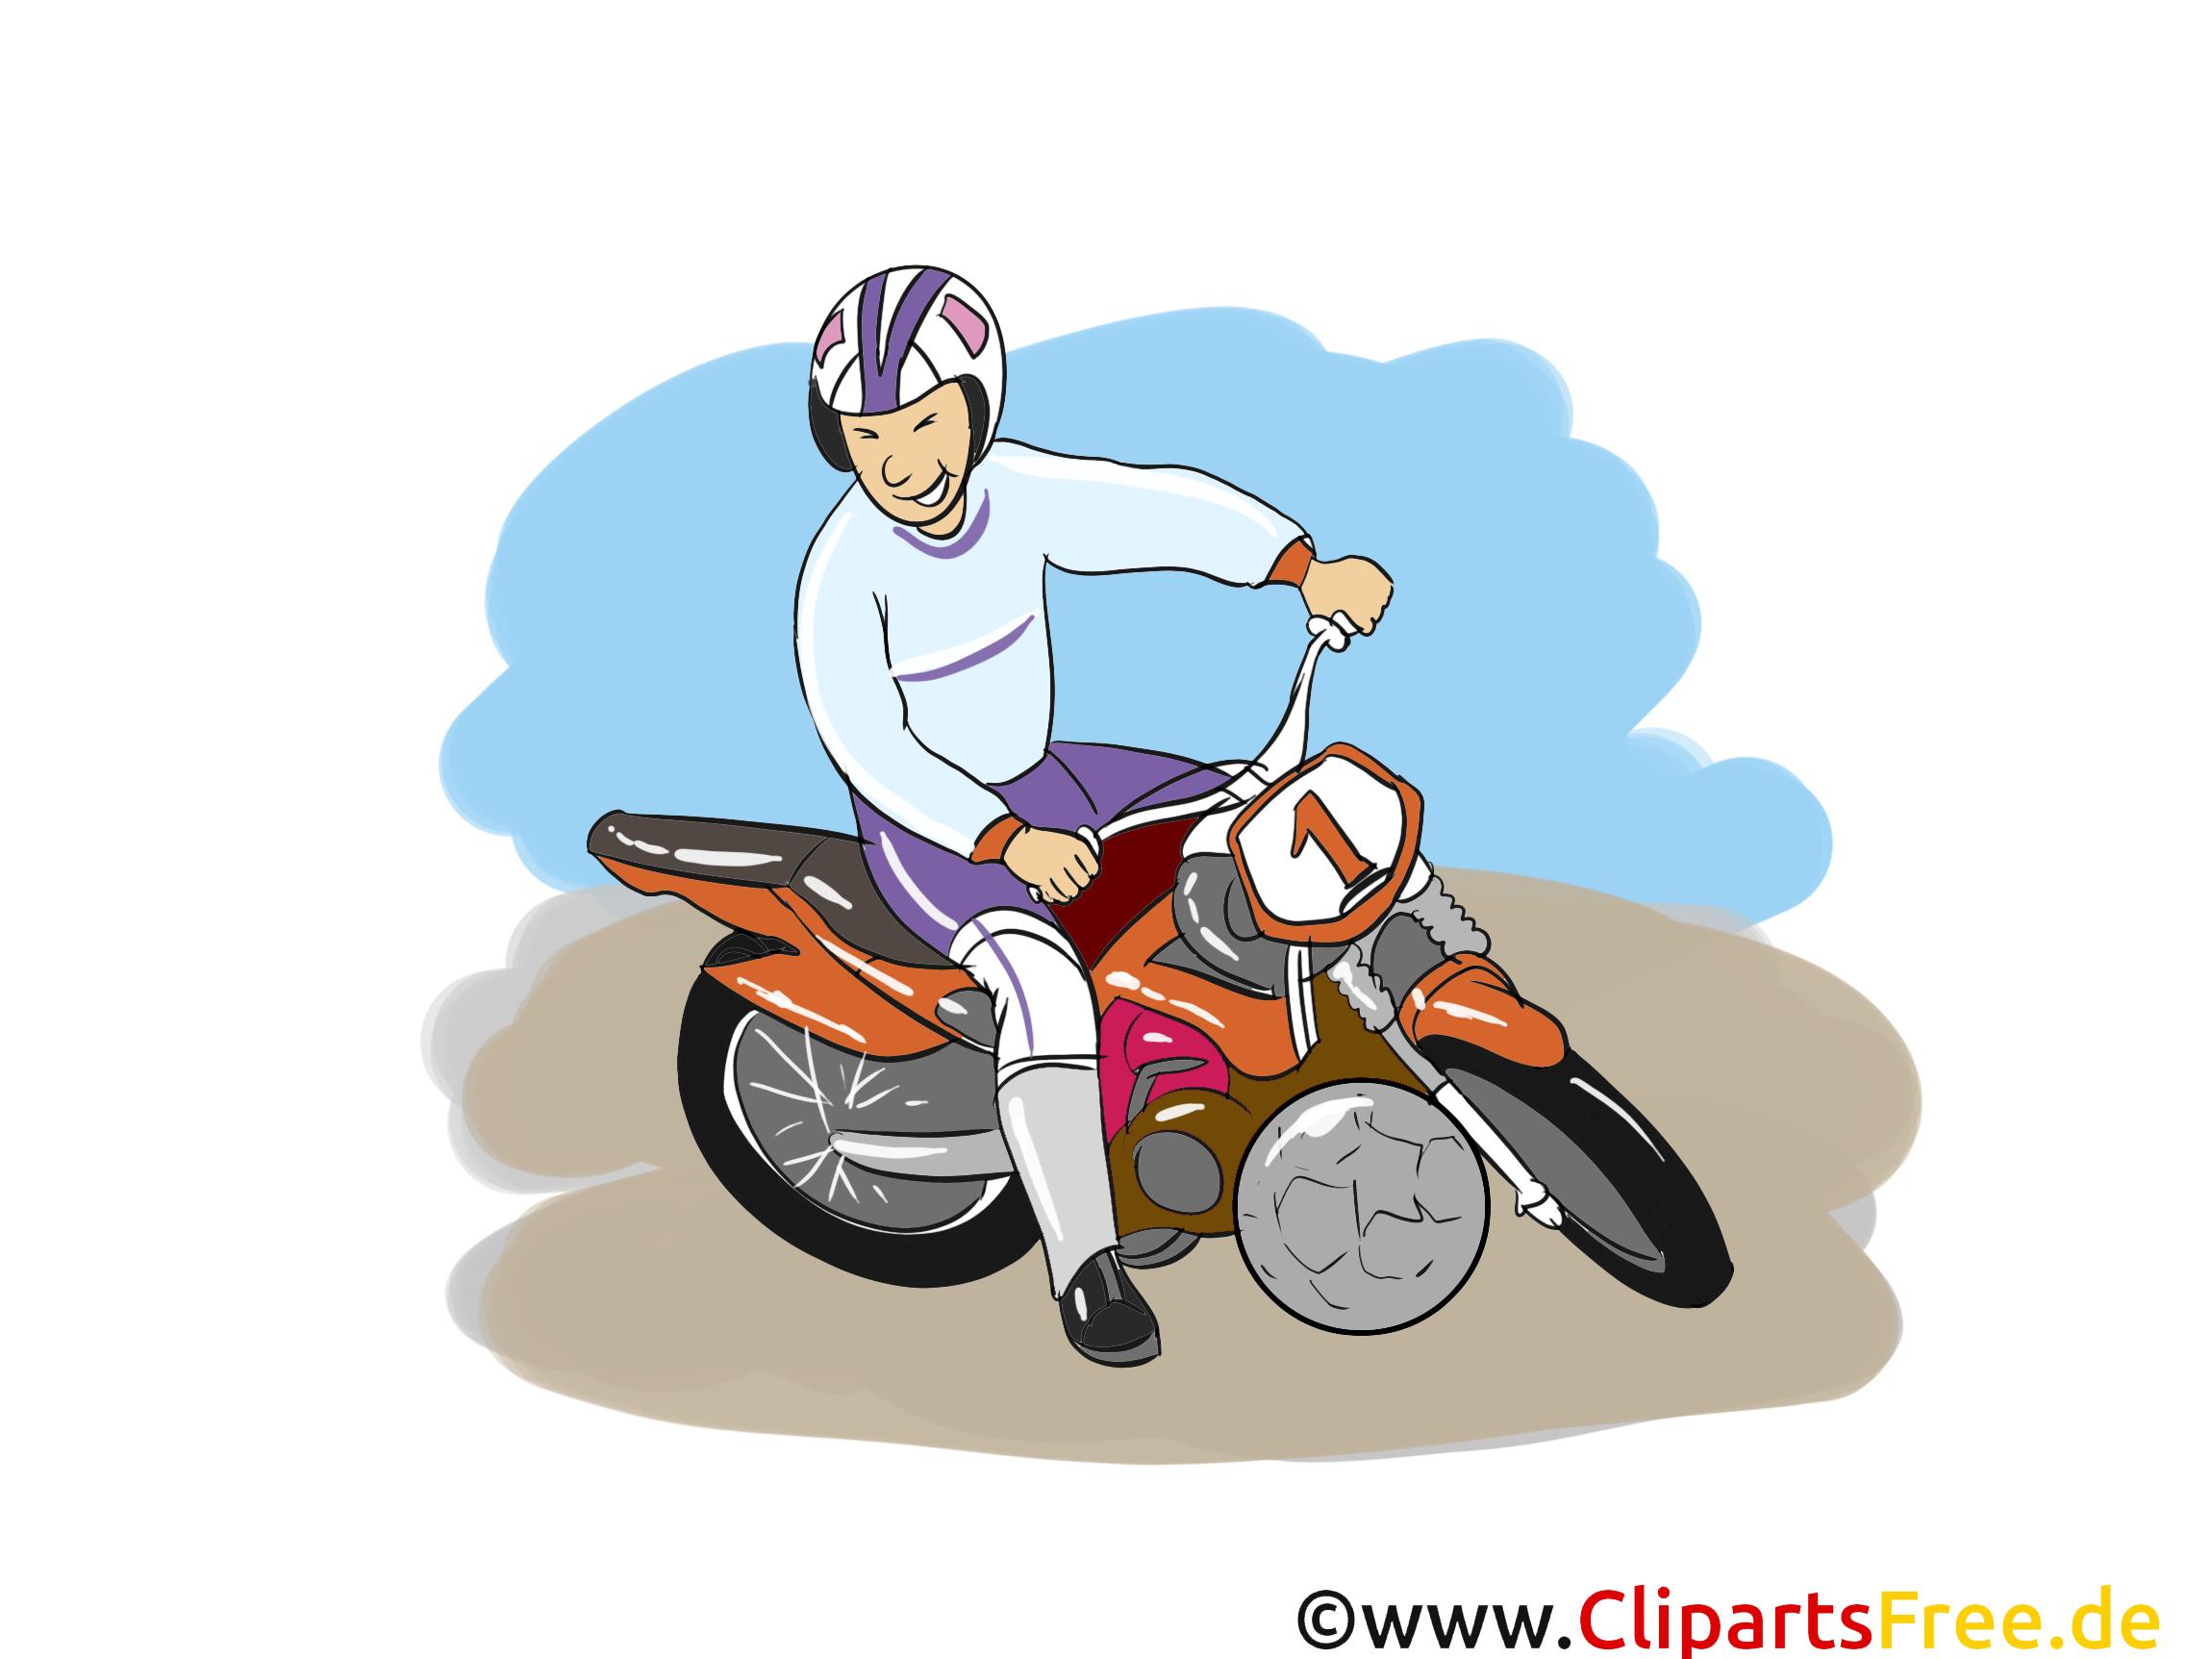 Motoball Championship Illustratie, Afbeelding, Cartoon, Afbeelding